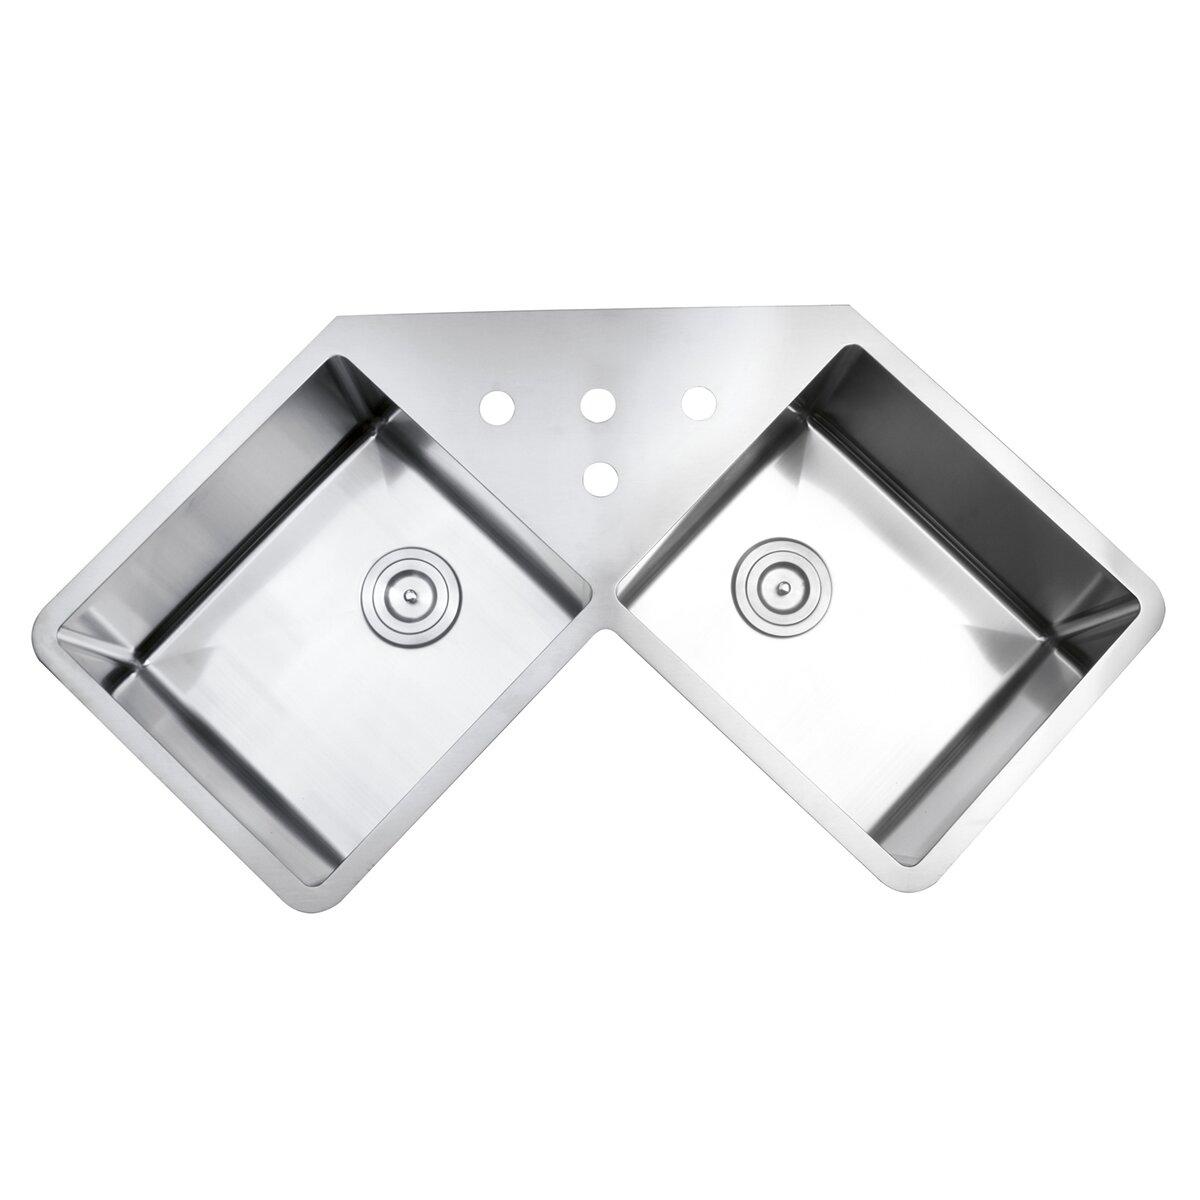 Gravena  X  Undermount Double Bowl Kitchen Sink